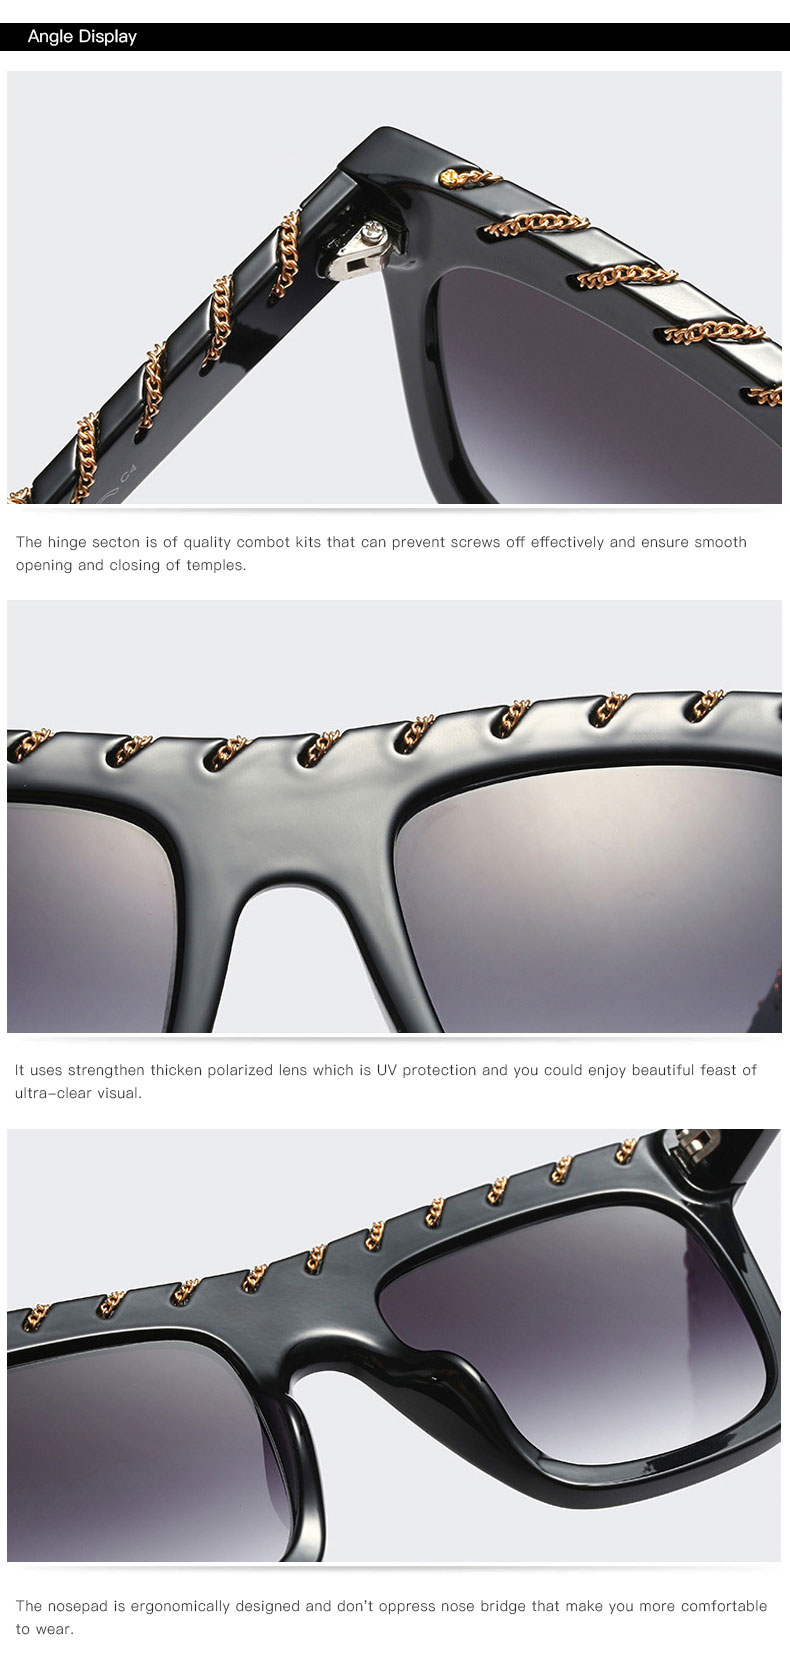 YDO Big Size Sunglasses Women 2019 Square Sunglasses Luxury Brand Vintage Sunglasses  Oversized Sun Glasses Fashion Shades UV400 (1)